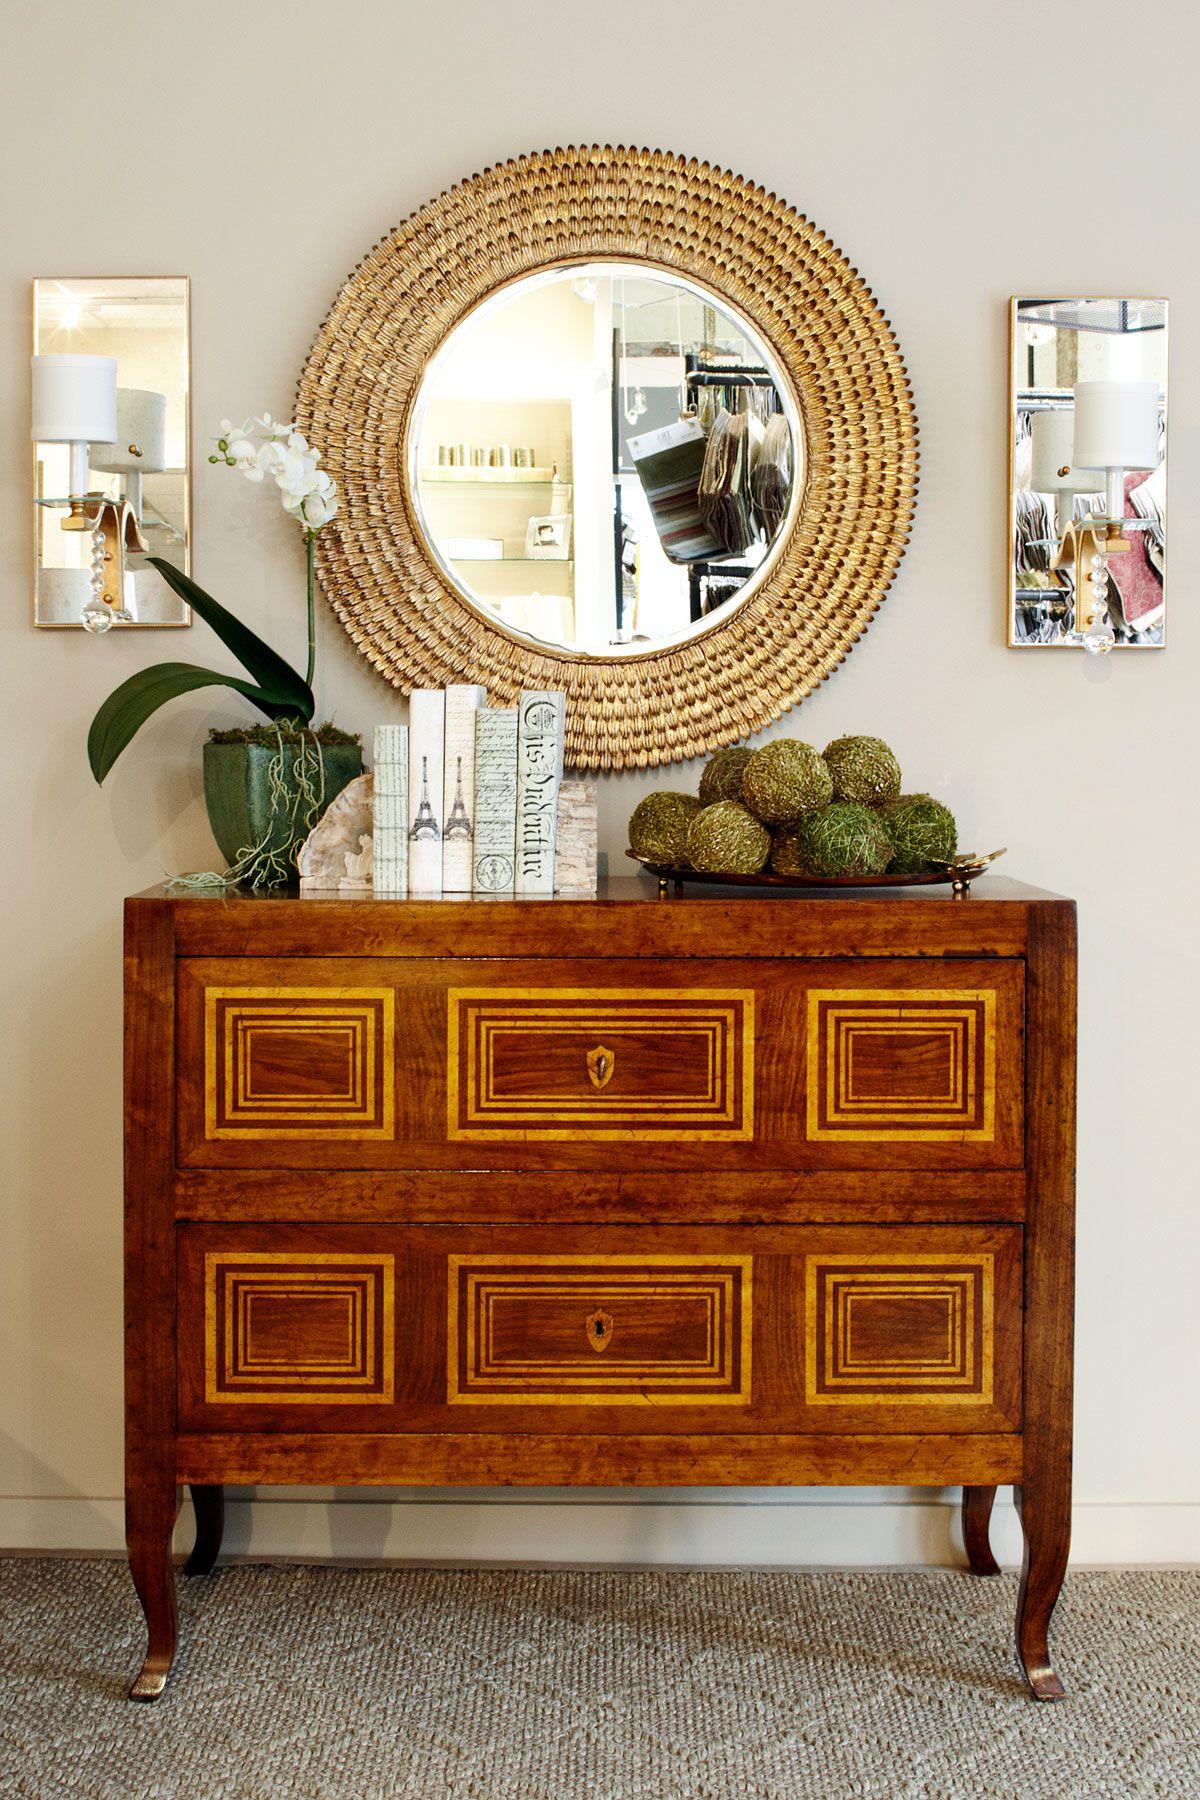 Antique Chest Gold Details Round Mirror Sconces